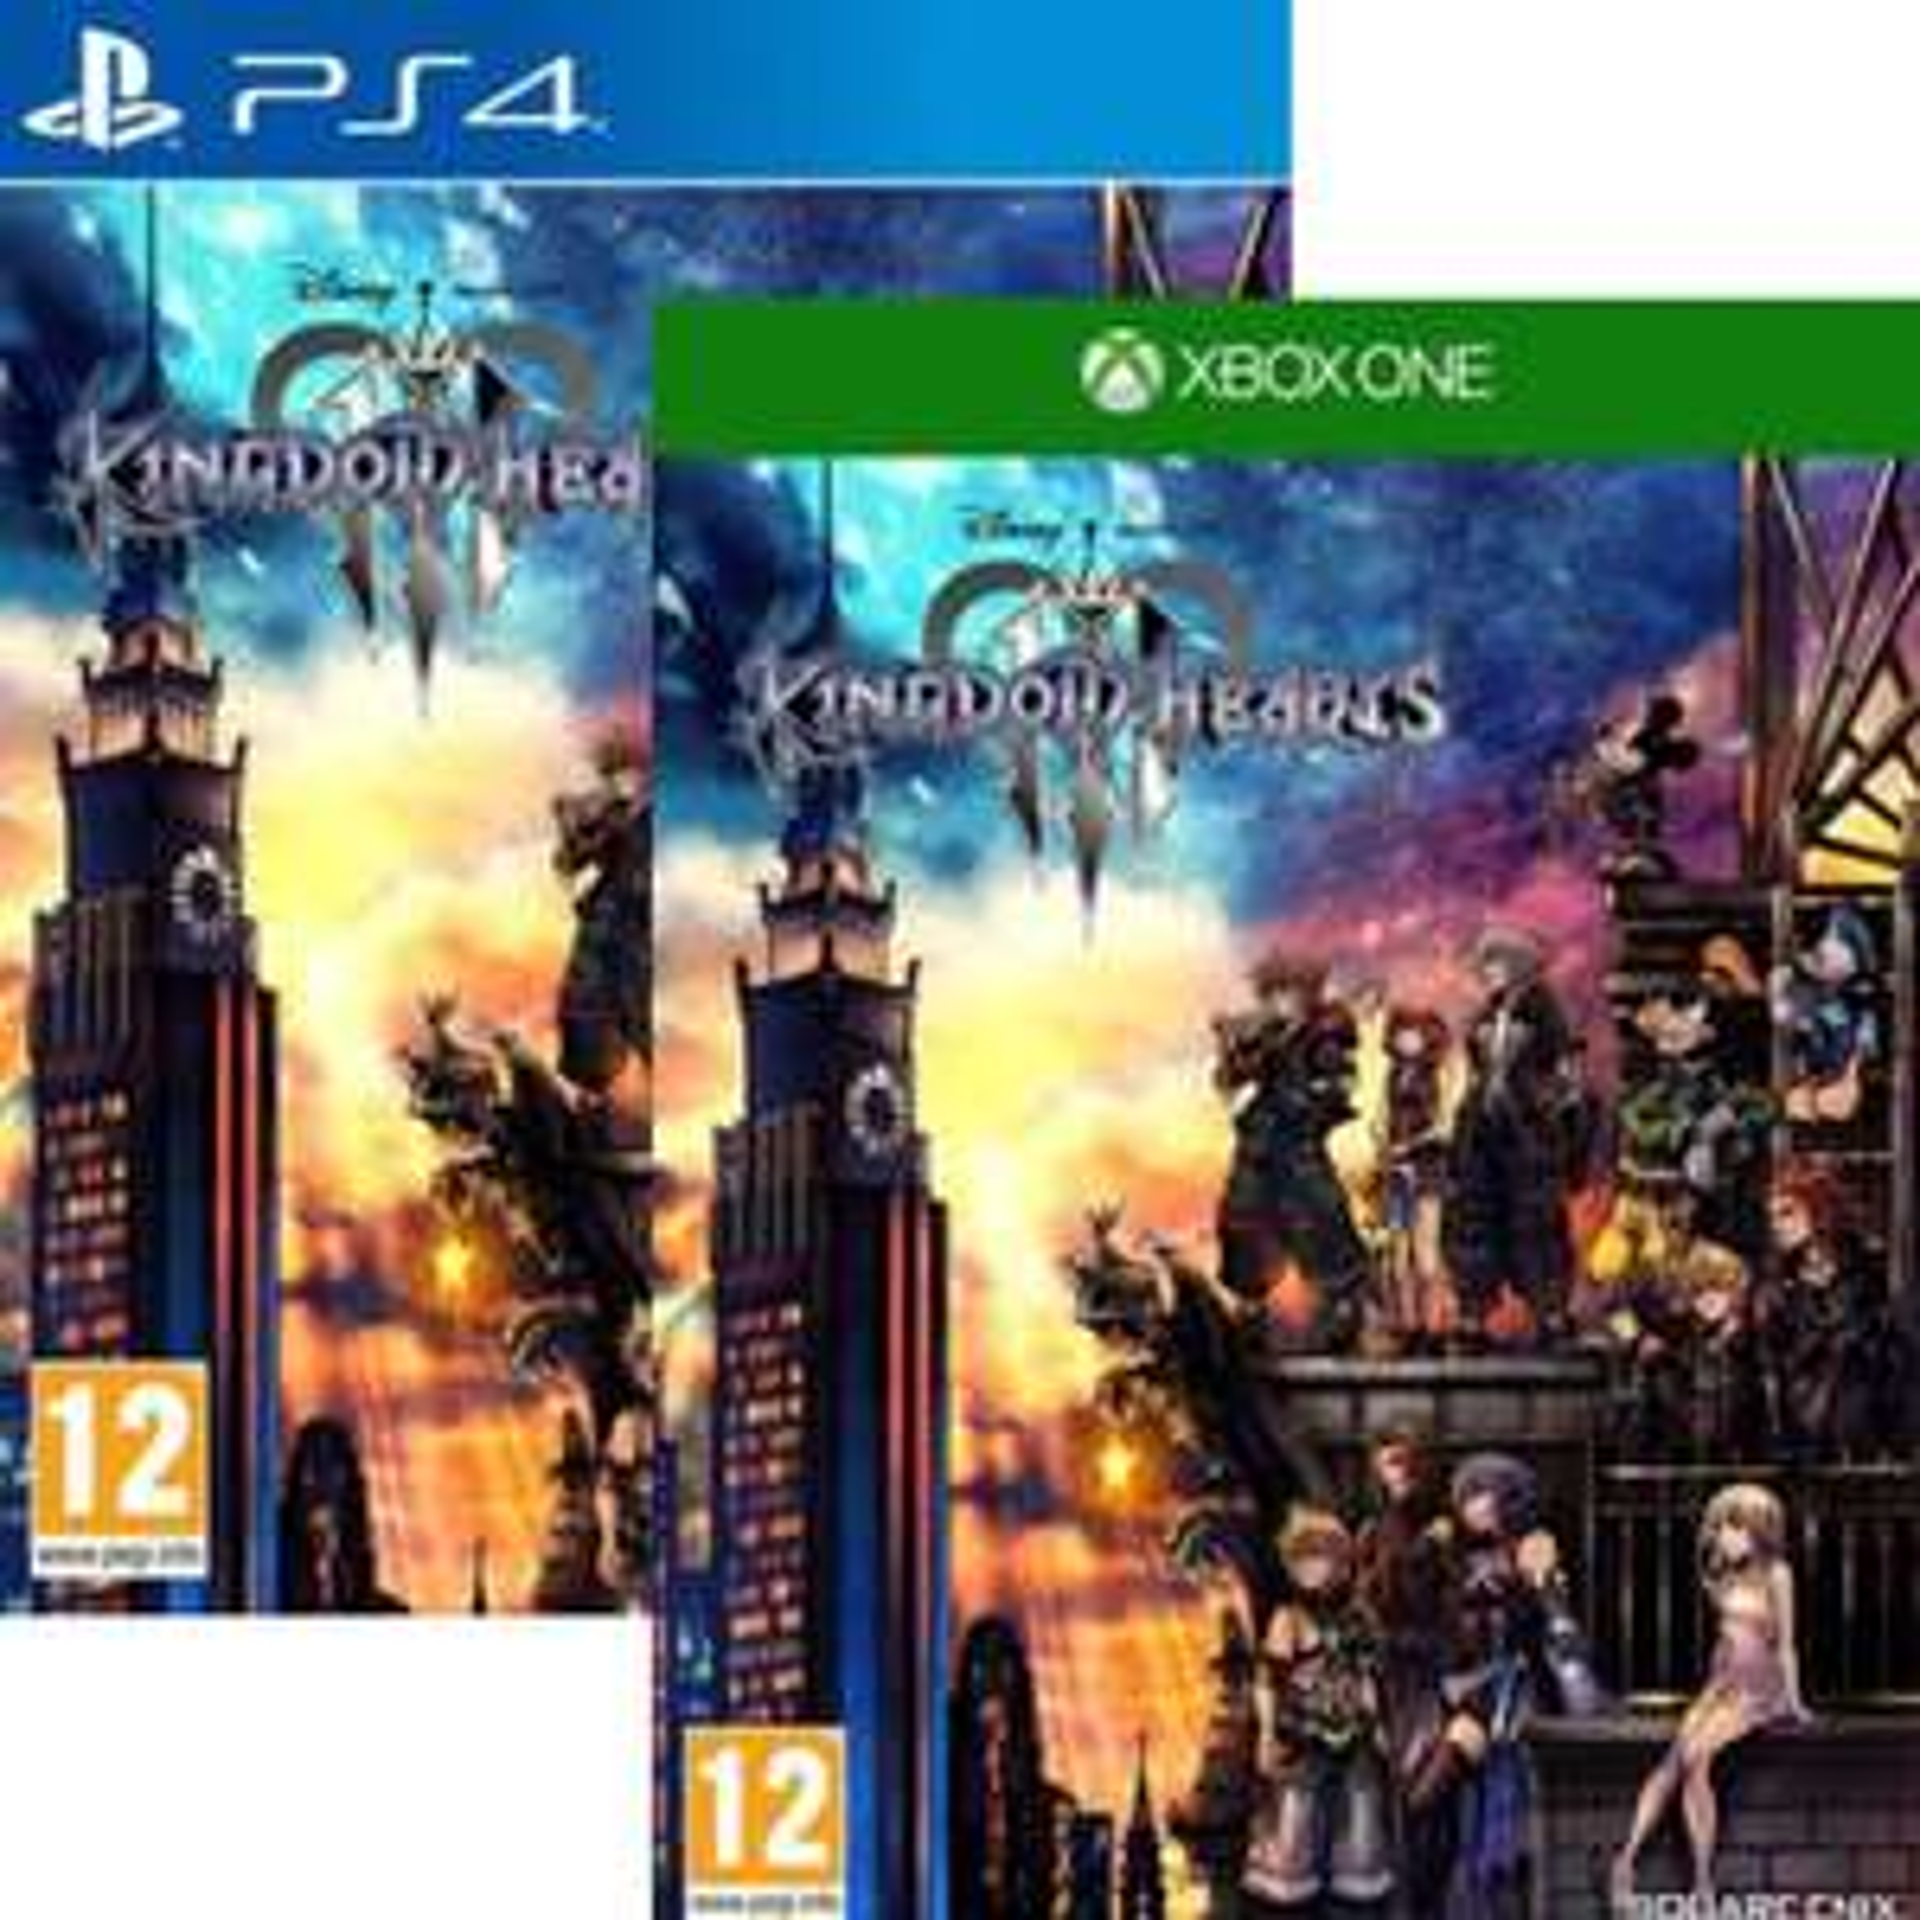 Kingdom Hearts 3 sur Xbox One ou PS4